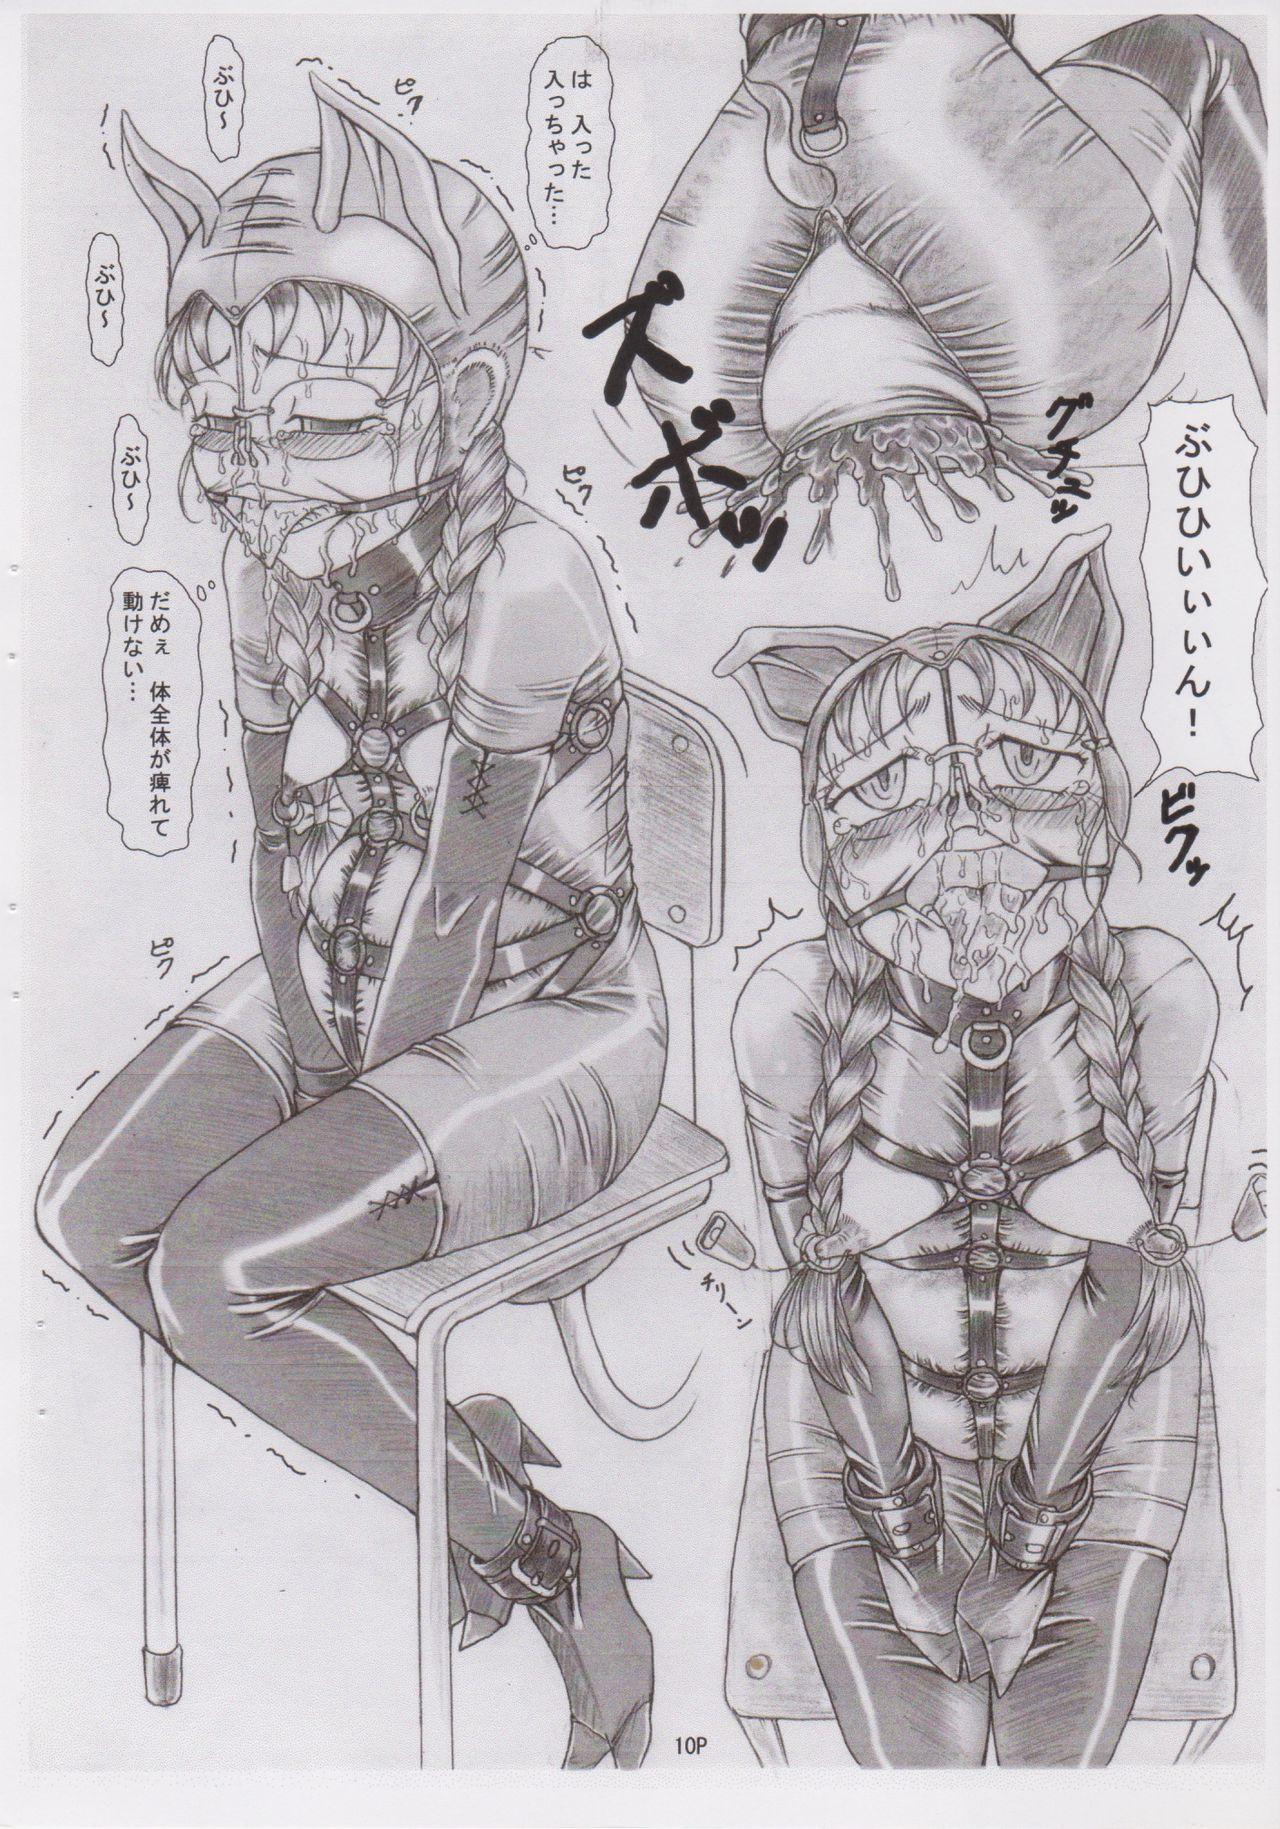 (C78) [Nekoneko Panchu! (Nekoneko Panchu)] Sanshimai Choukyou Yuugi [Yukari Hen] Yukari-chan no Butabana Kachiku Choukyou [Anal Higyaku Jugyou] 9